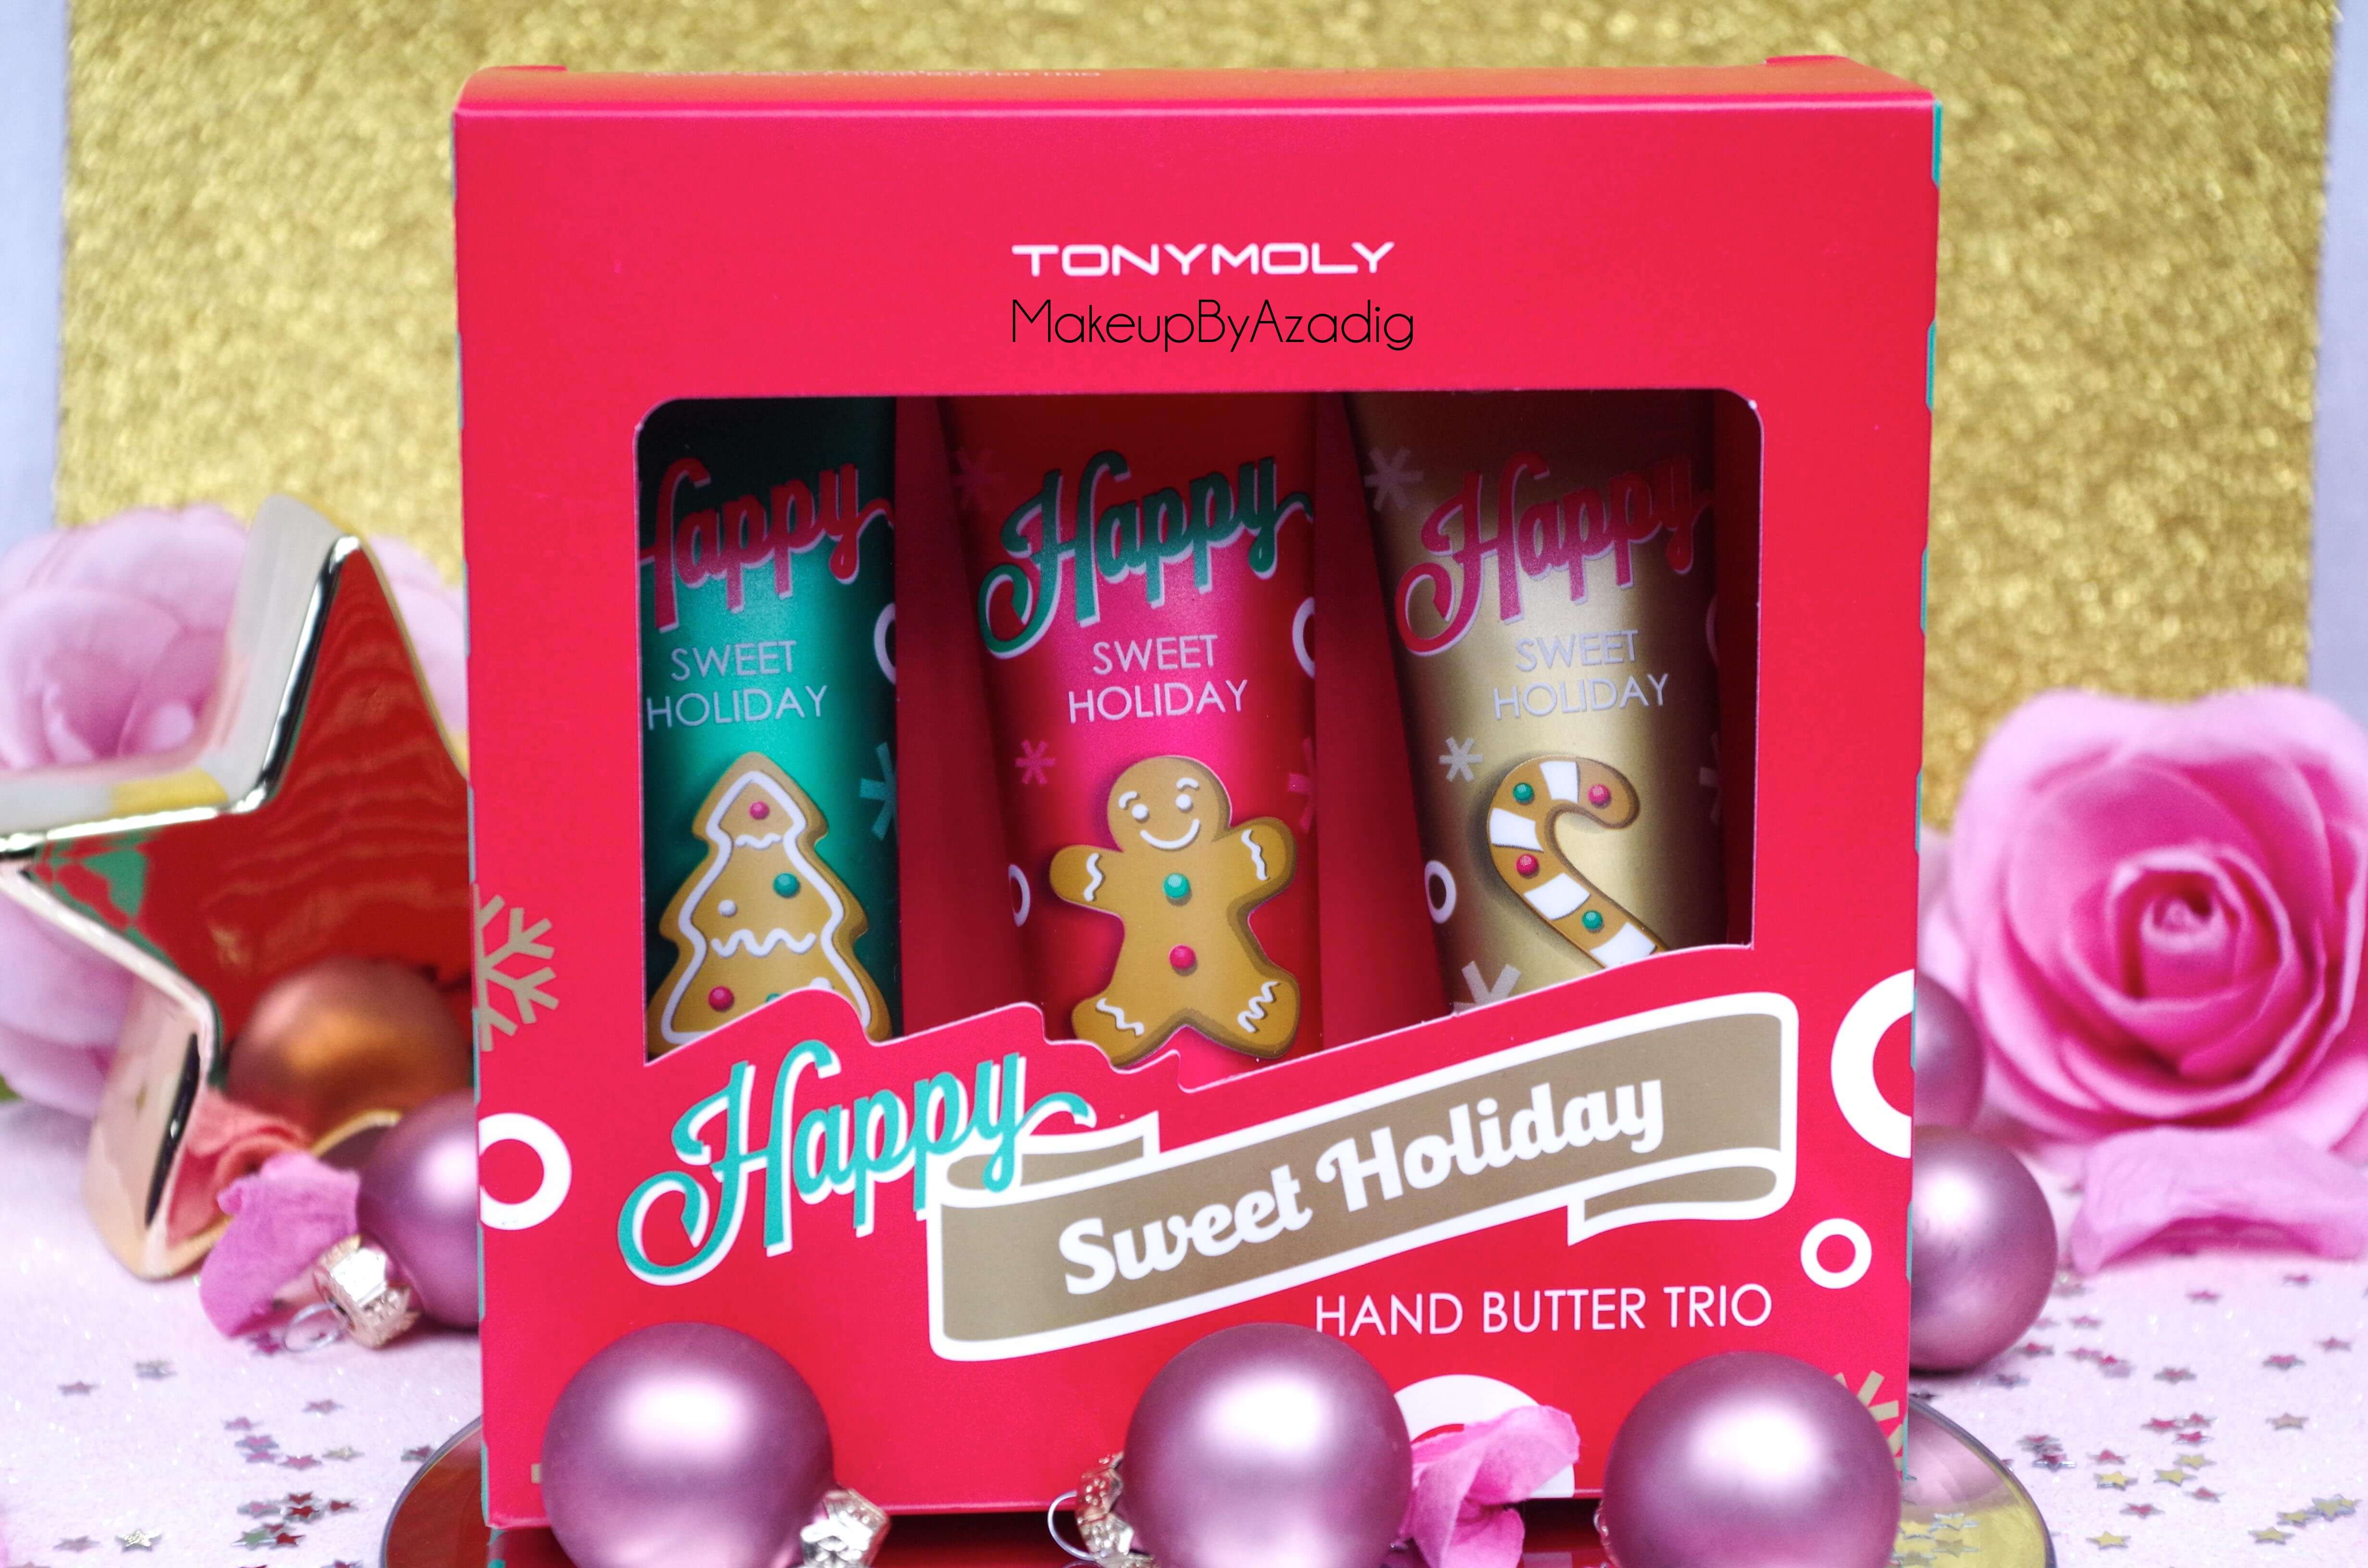 makeupbyazadig-tonymoly-sephora-paris-troyes-creme-mains-collection-noel-holiday-avis-revue-sweet